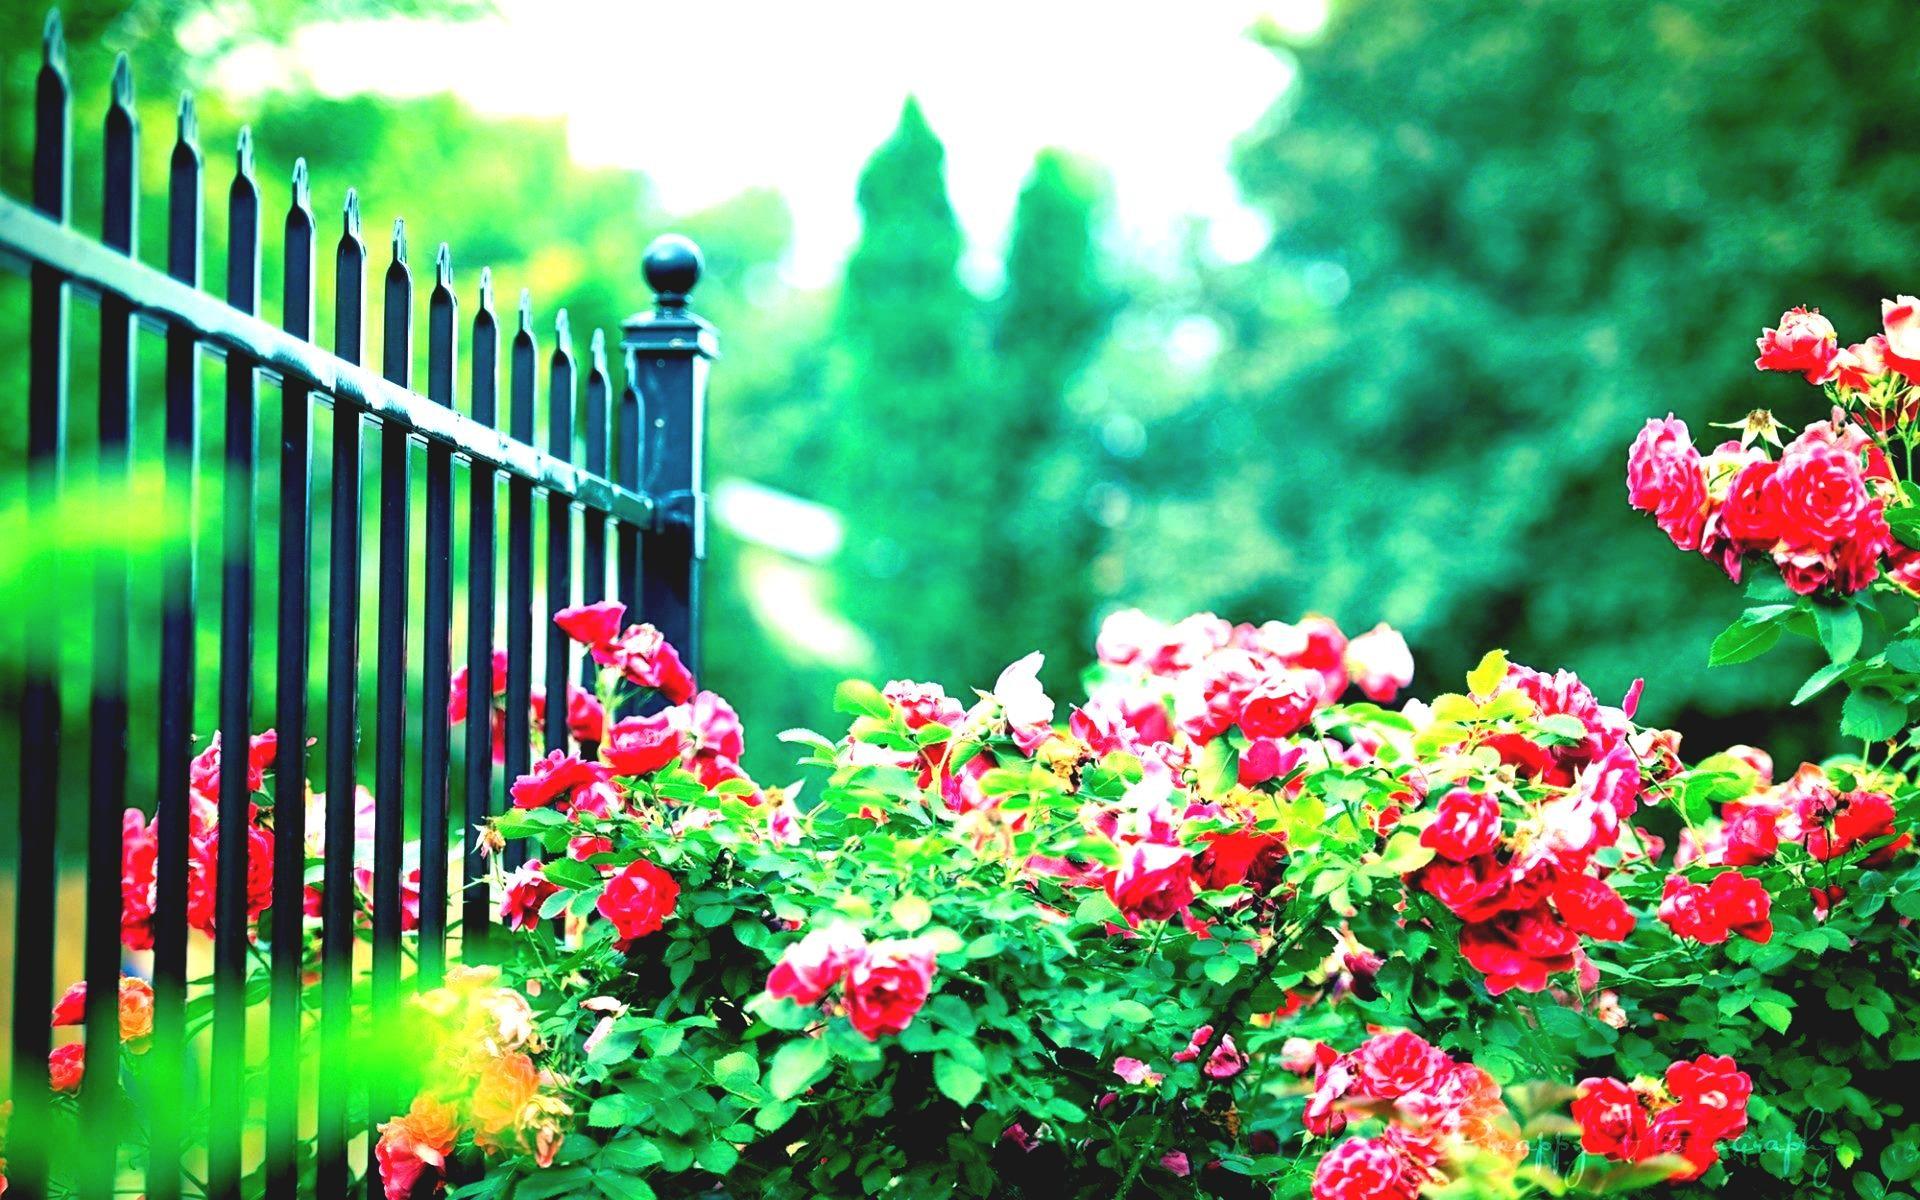 Res: 1920x1200, Beautiful Spain Roses In Garden Wallpaper Wallpapers New Hd